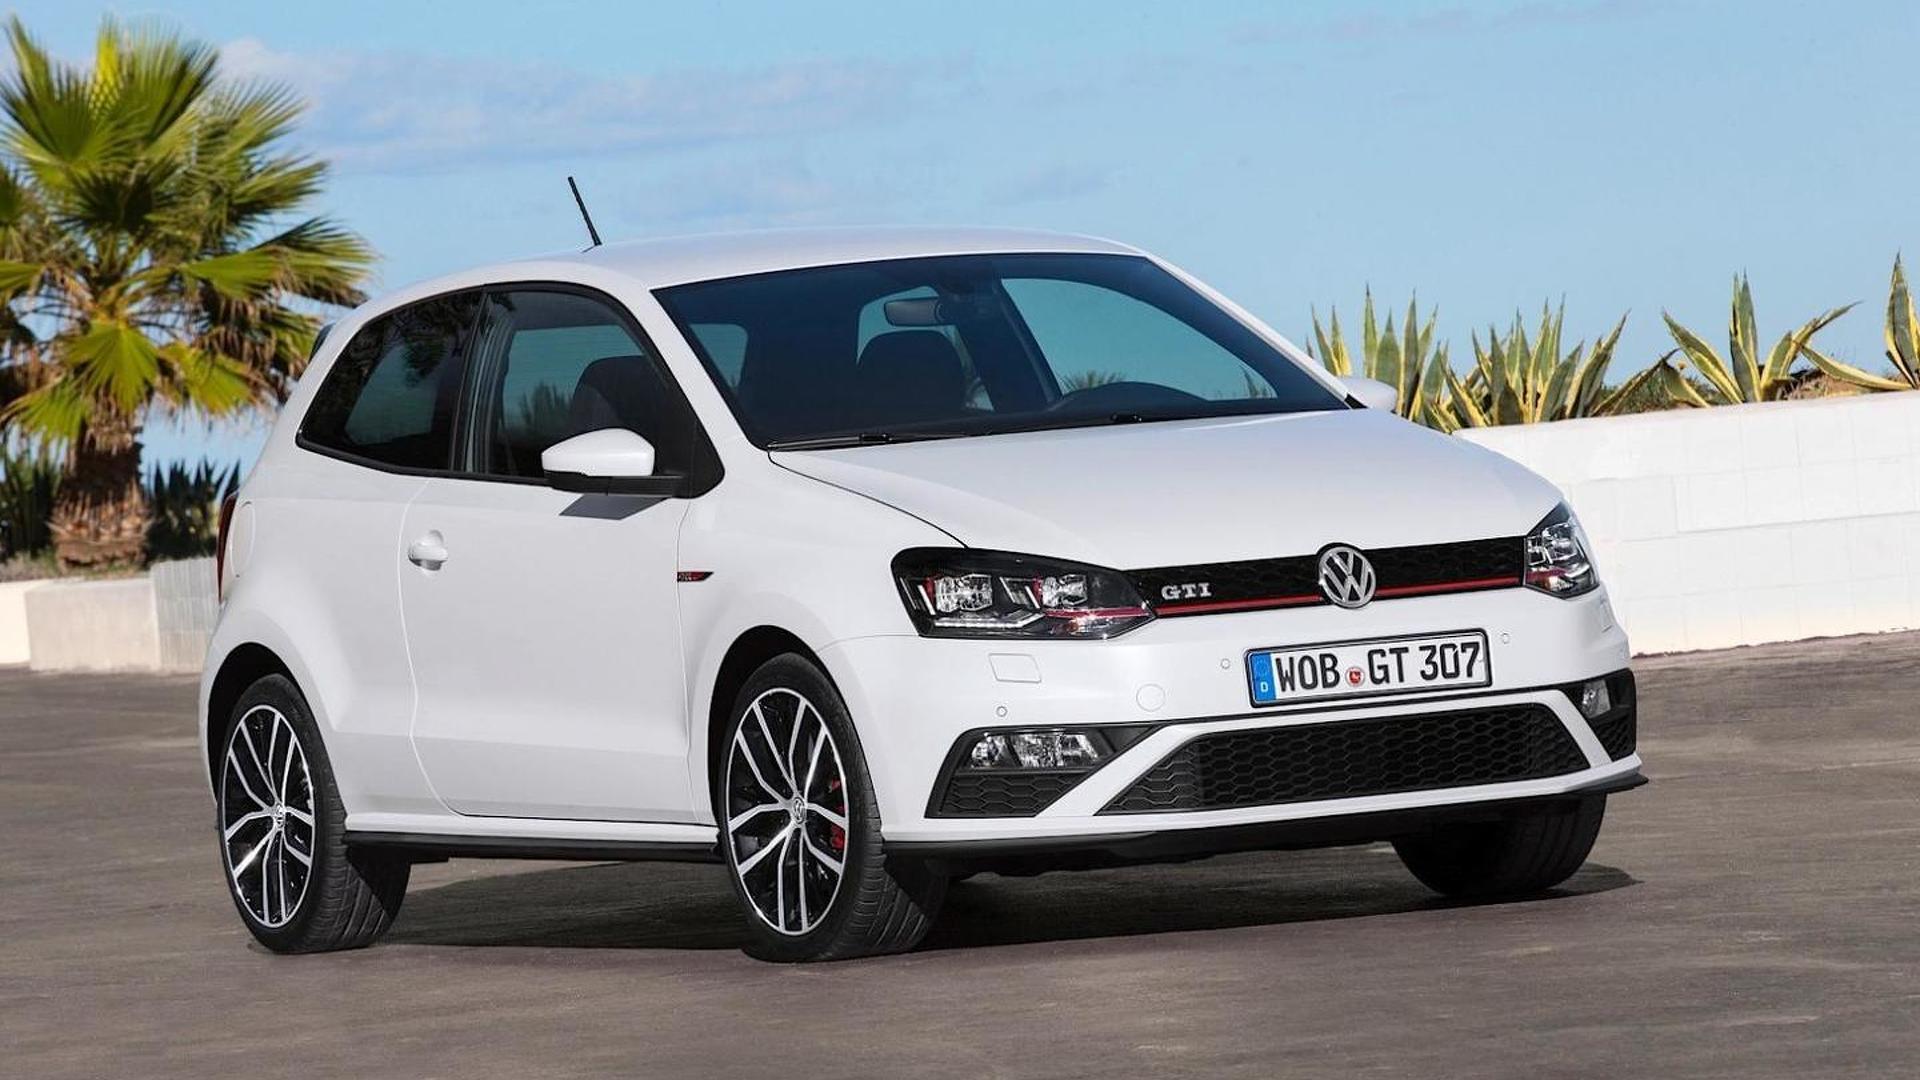 Volkswagen Polo GTI. Рестайлинг 2014